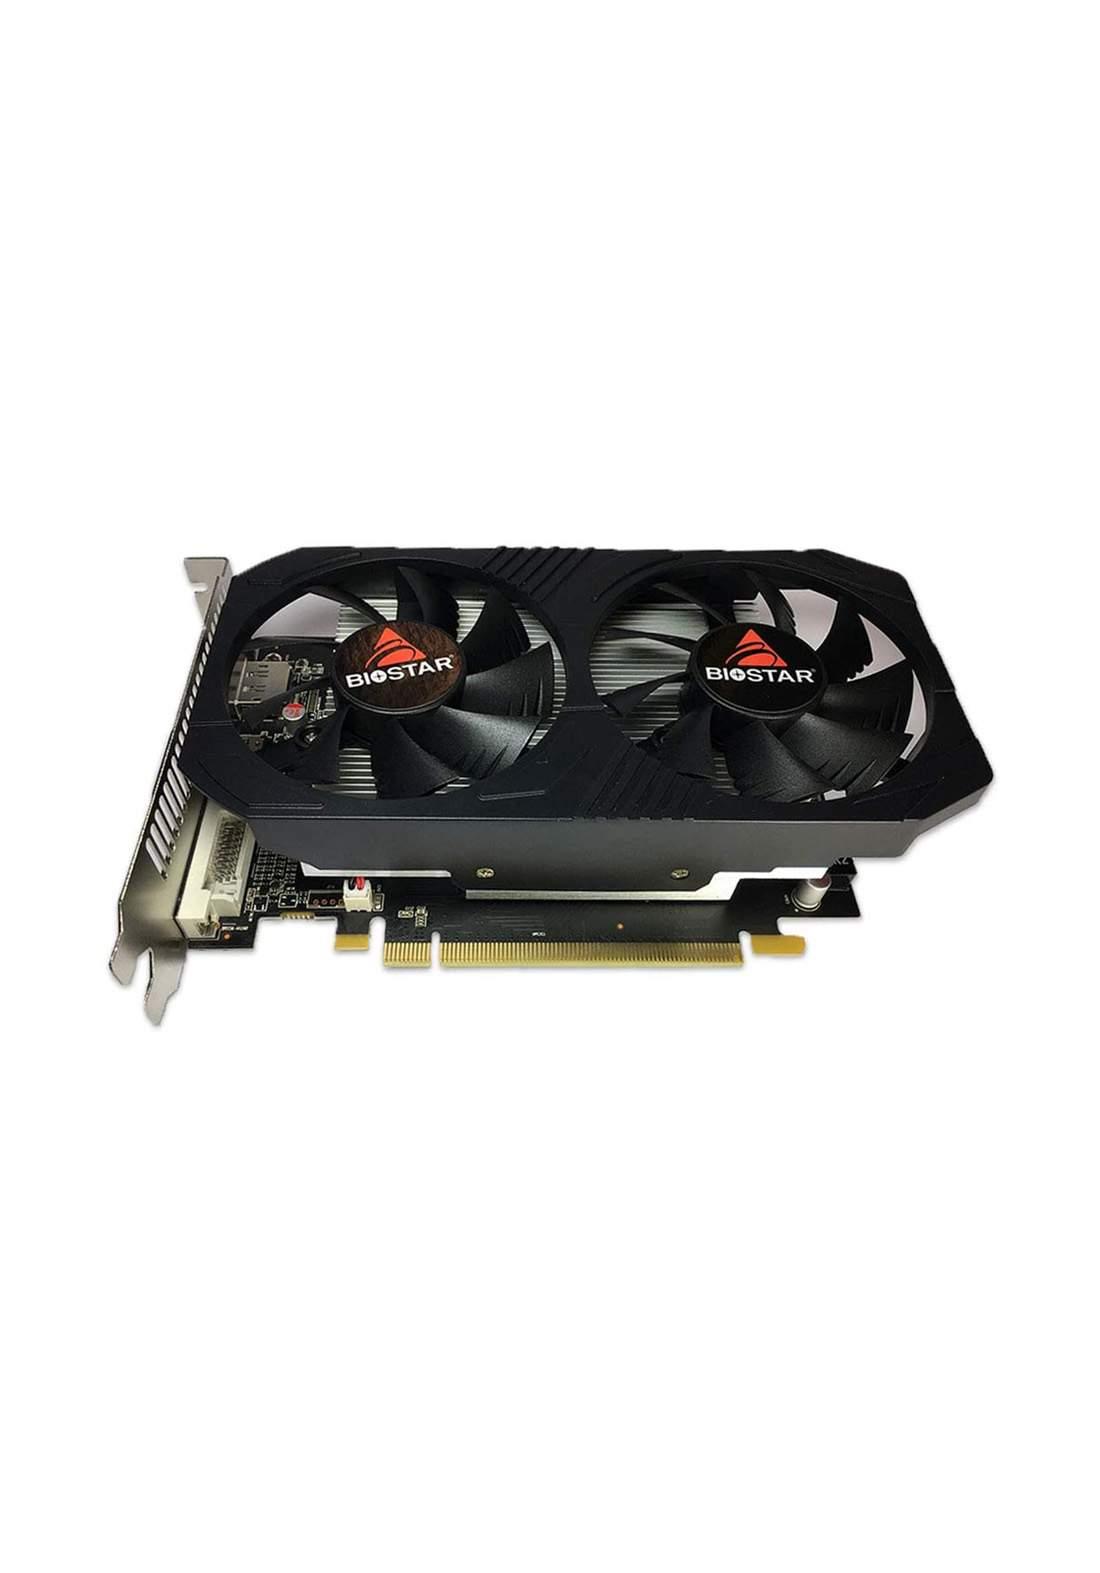 Biostar RX560 OC Gaming Radeon 4GB Cooling Fan - Black